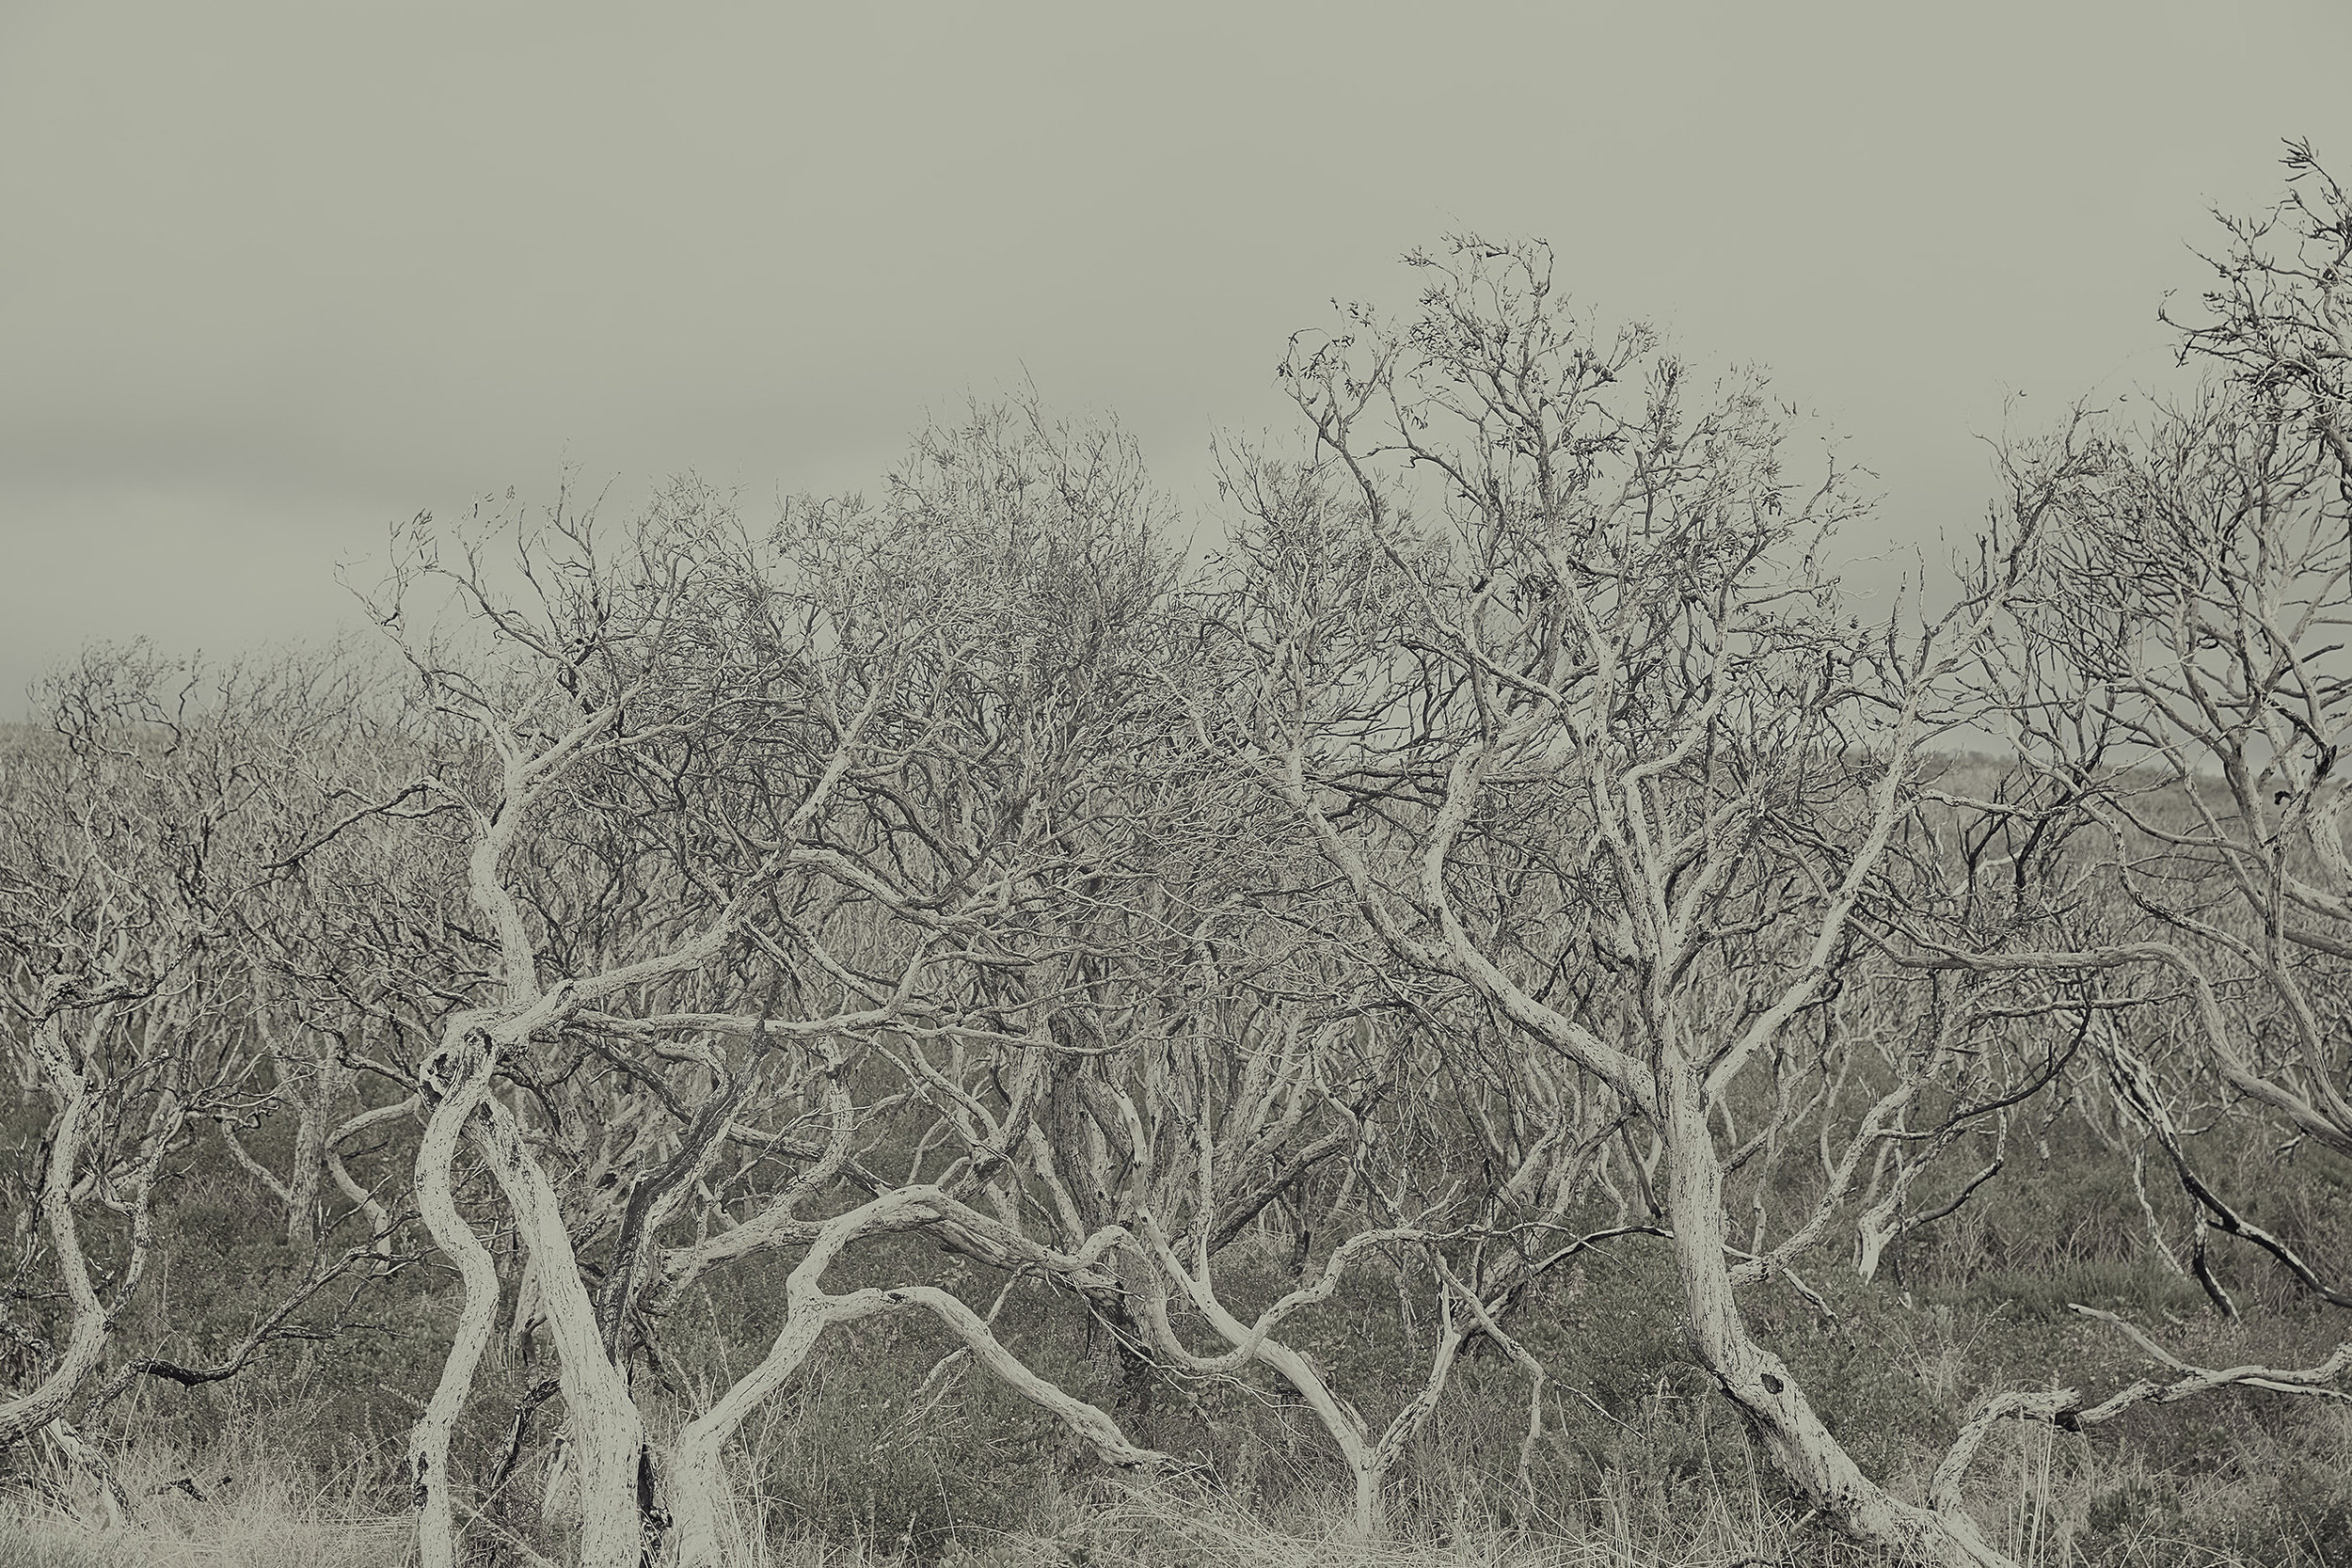 Patrick_Schuttler_Landscape_026.jpg